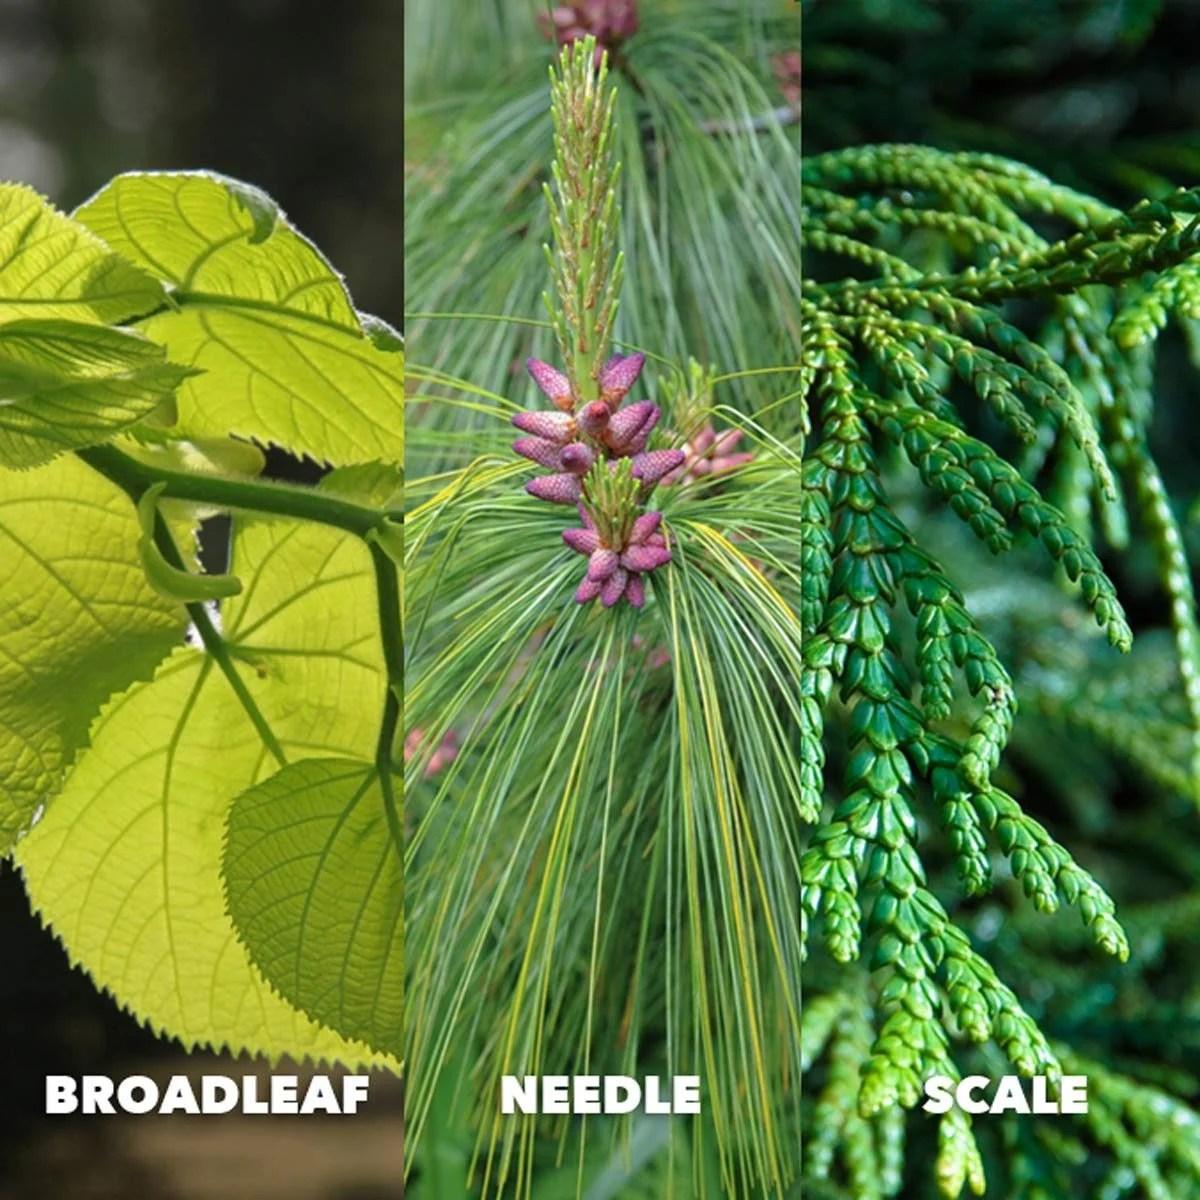 broadleaf needle scale